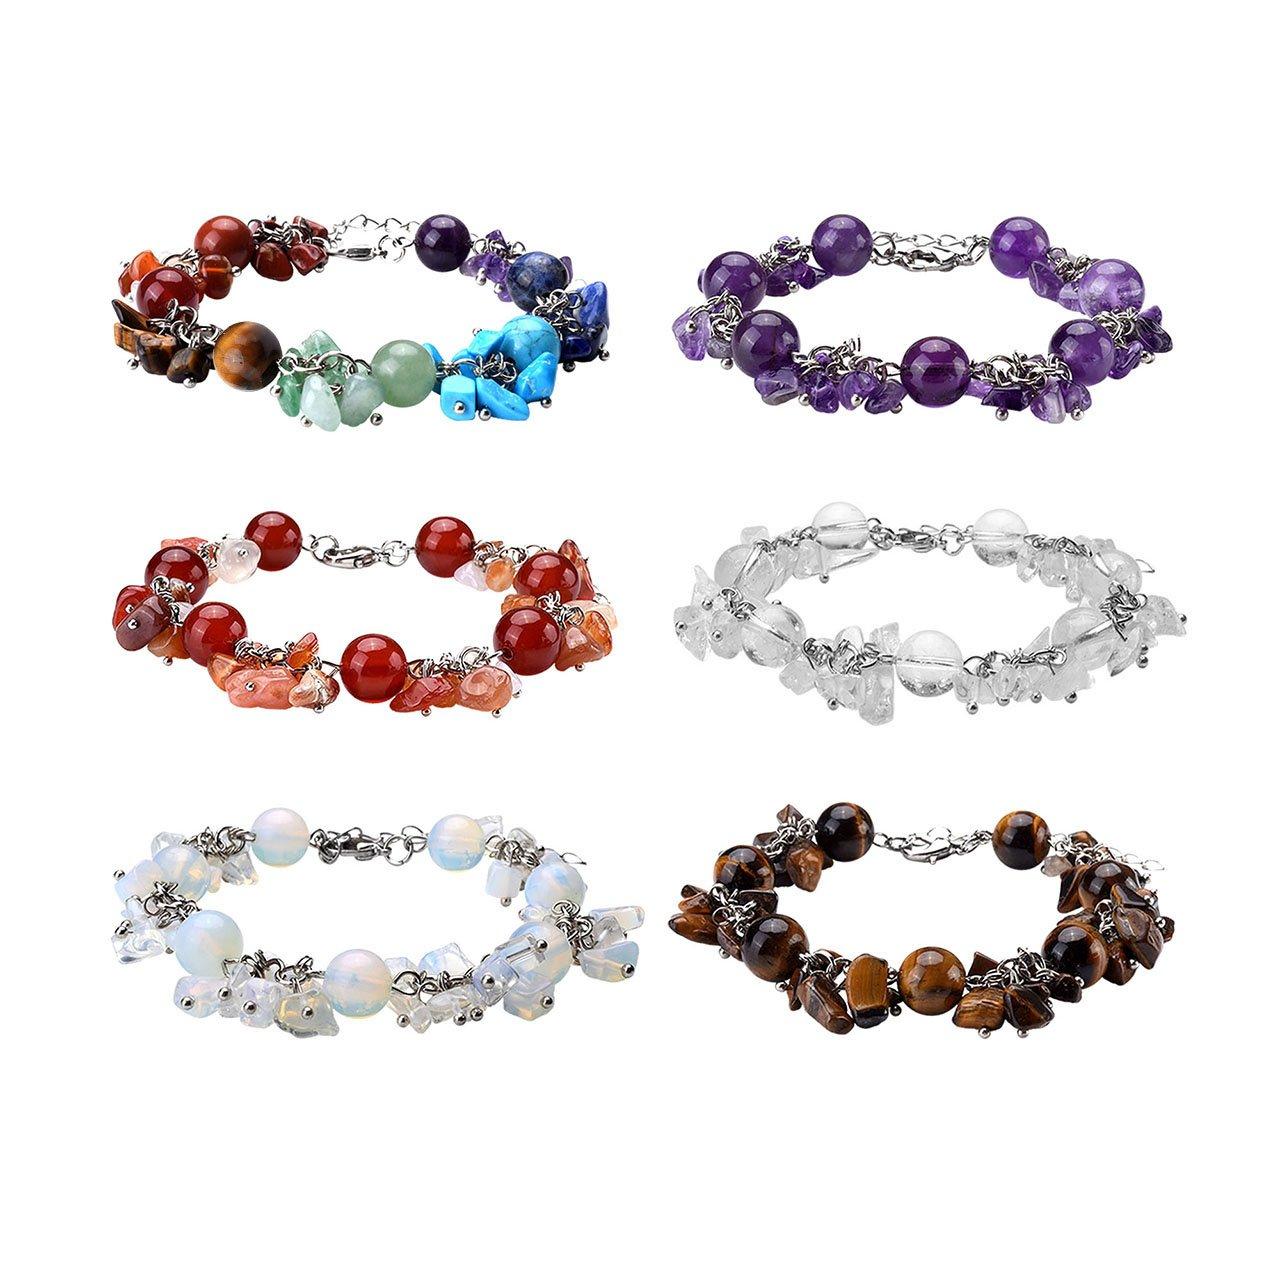 Top Plaza Women 7 Chakra Reiki Healing Balancing Crystal Beads Bracelet Natural Gemstone Fashion Silver Tone Adjustable Bracelet(Set Of 6)